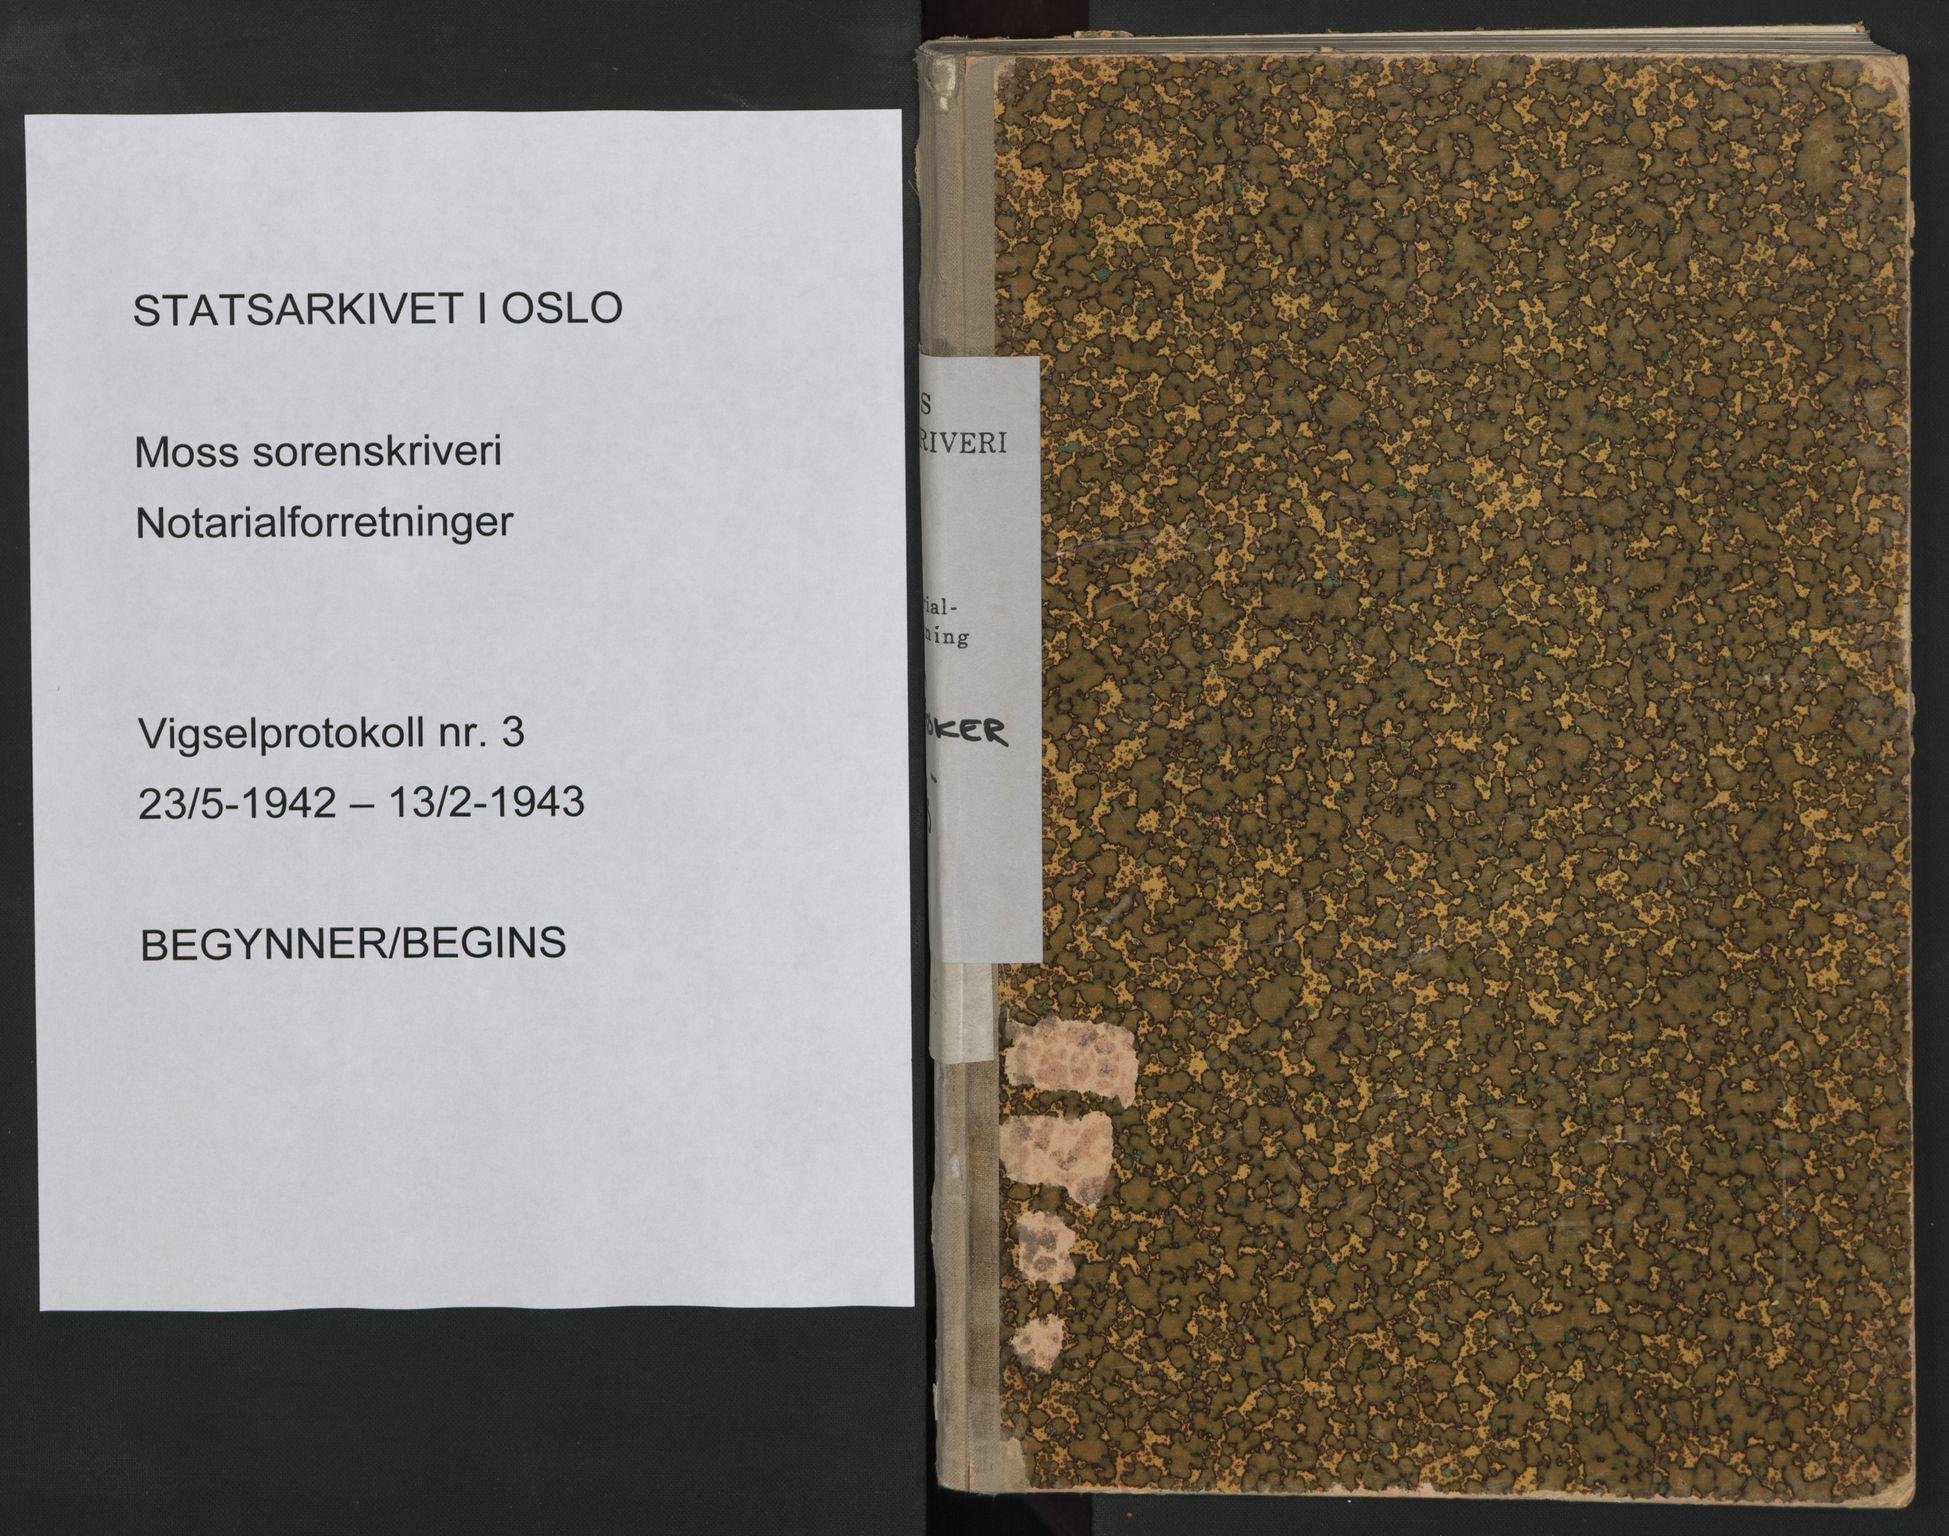 SAO, Moss sorenskriveri, 1942-1943, s. upaginert